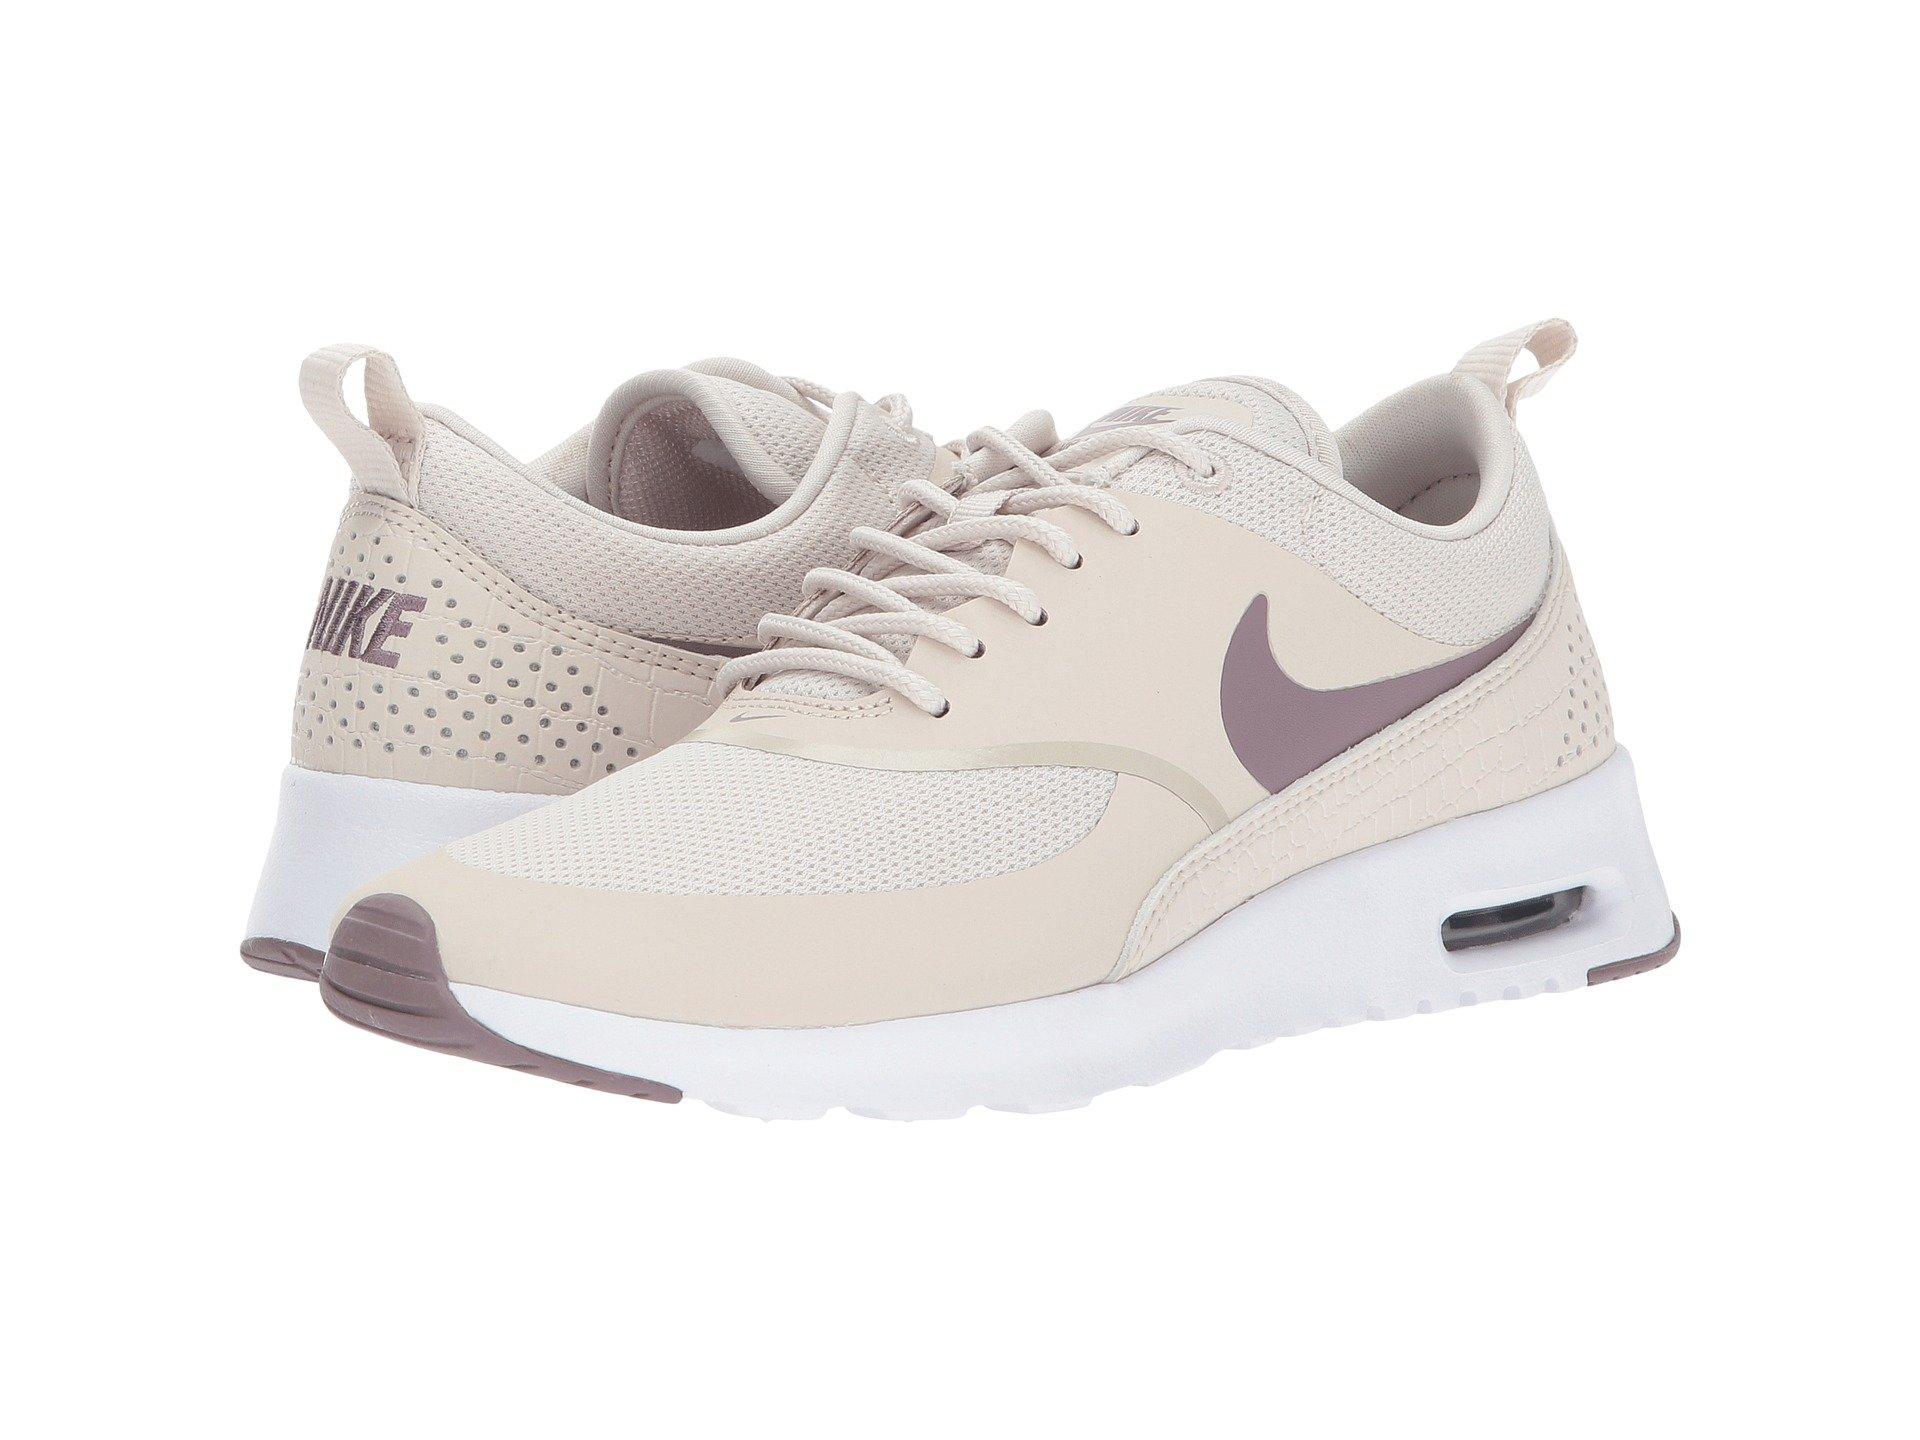 Nike  Air Max Thea, LIGHT OREWOOD BROWN/TAUPE GREY